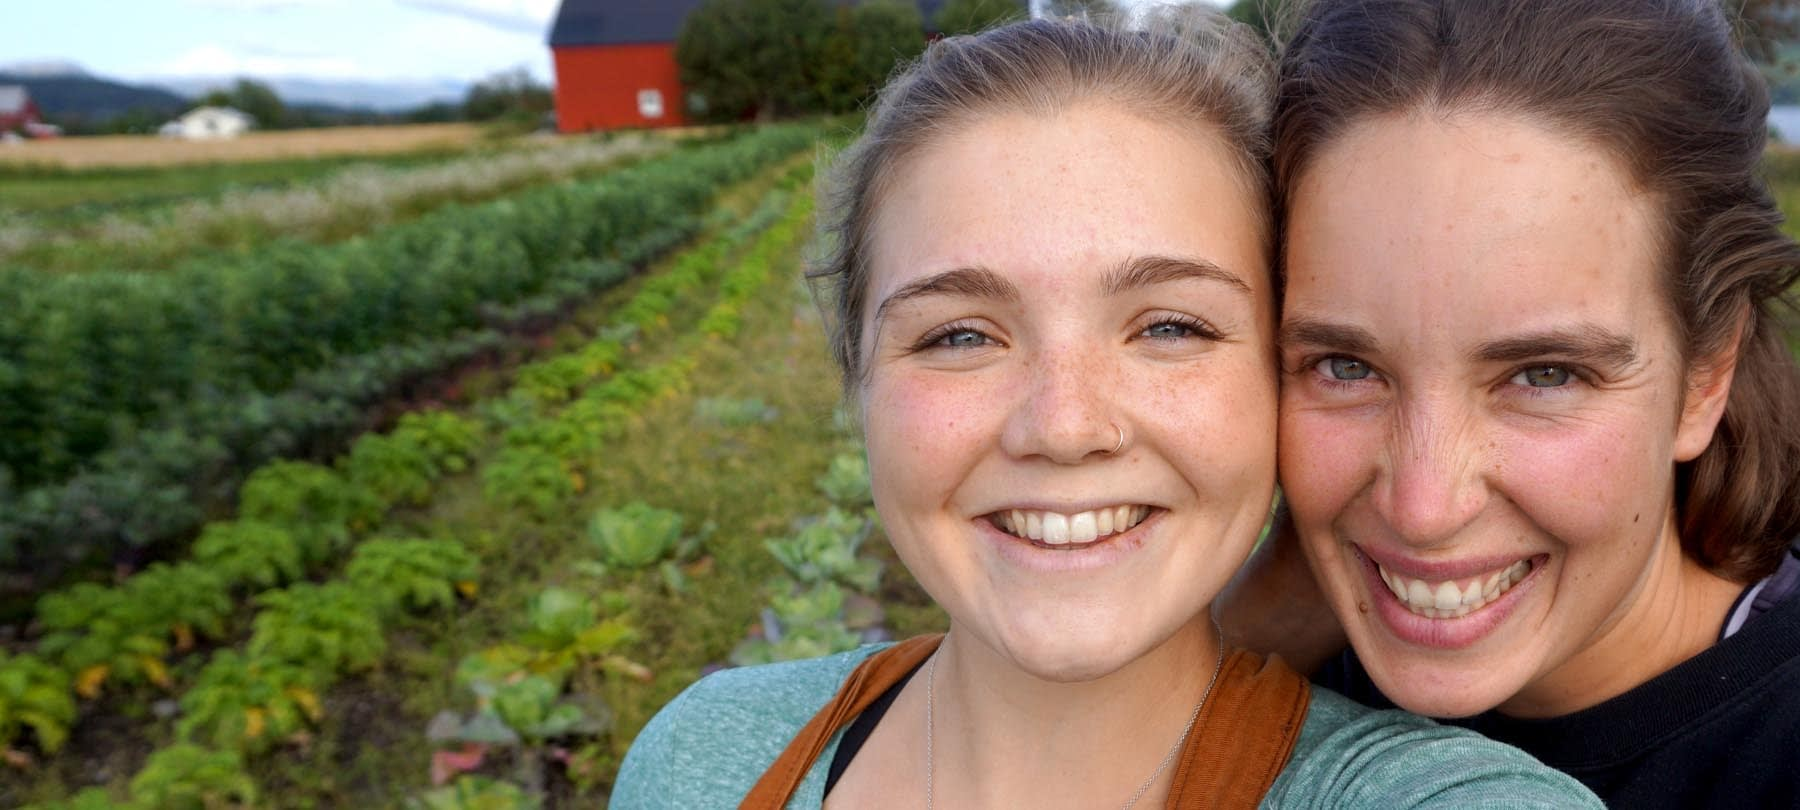 Happy girls in an organic vegetable field